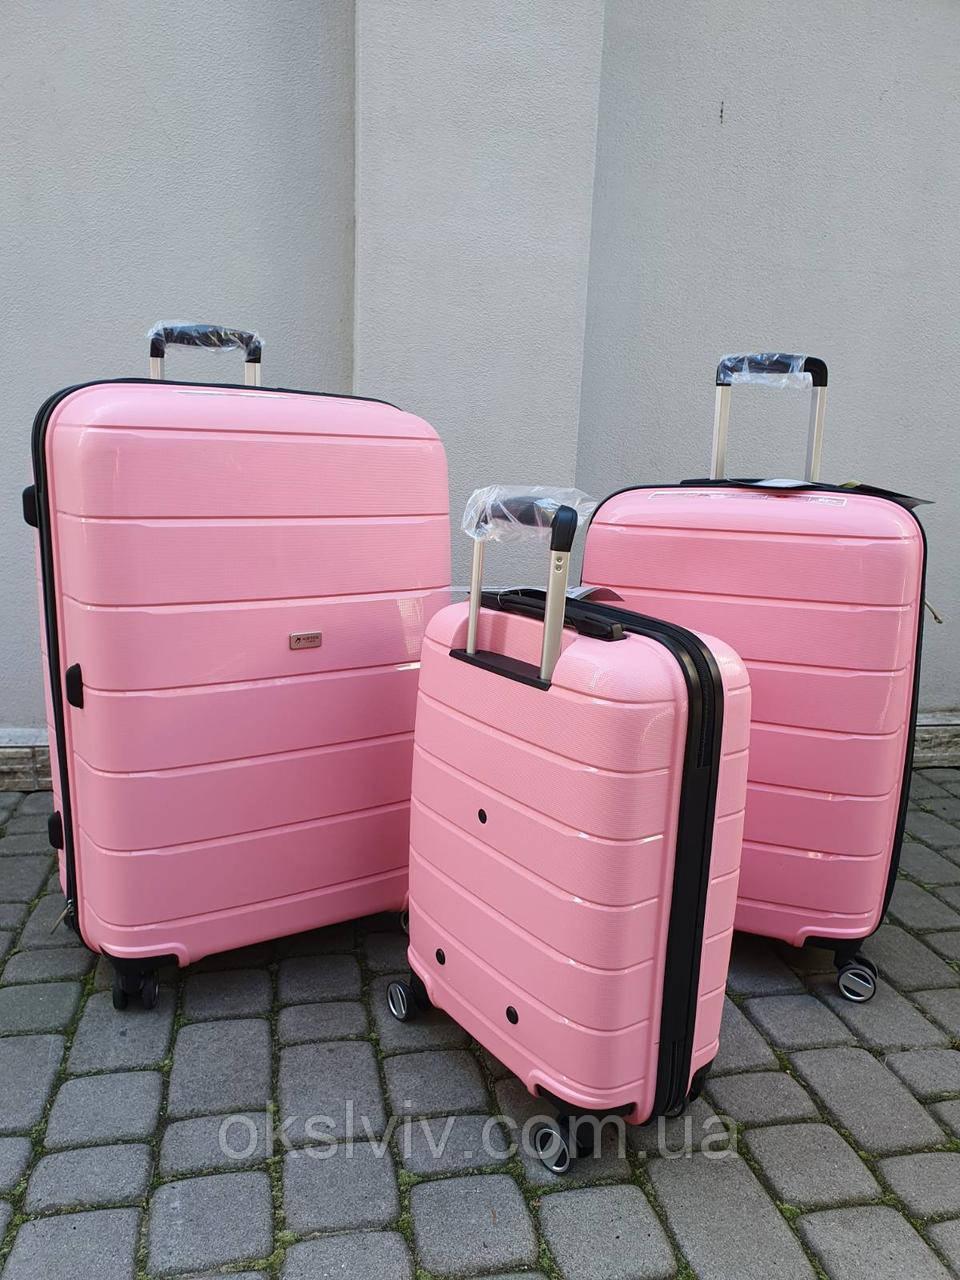 AIRTEX 232 Франція 100% polypropylene валізи чемодани, сумки на колесах